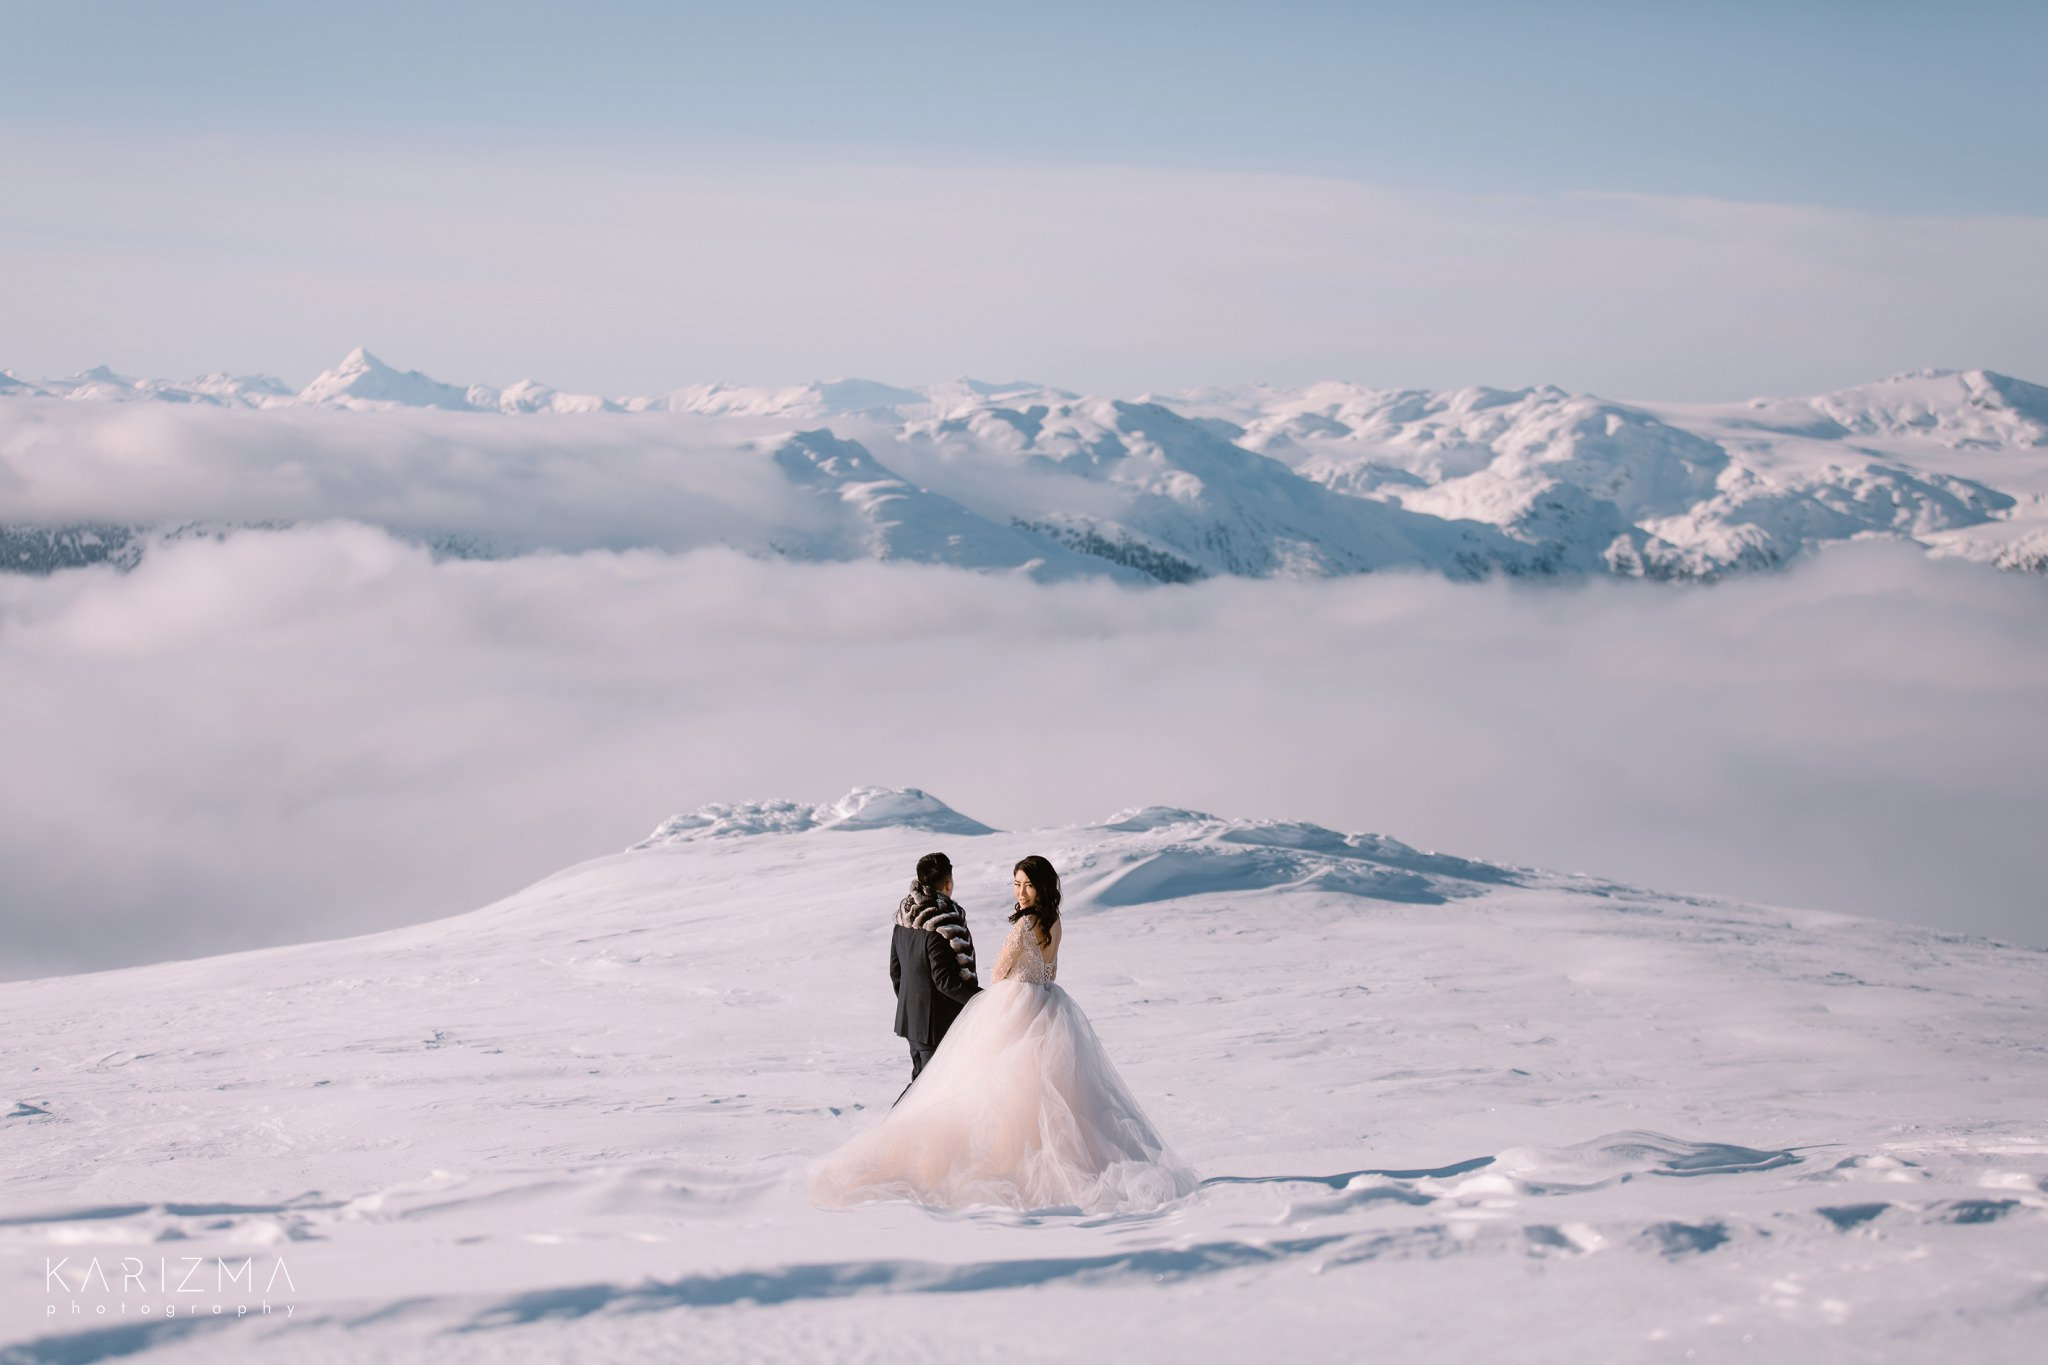 Bride and groom posing for their whistler pre-wedding photos in the mountains